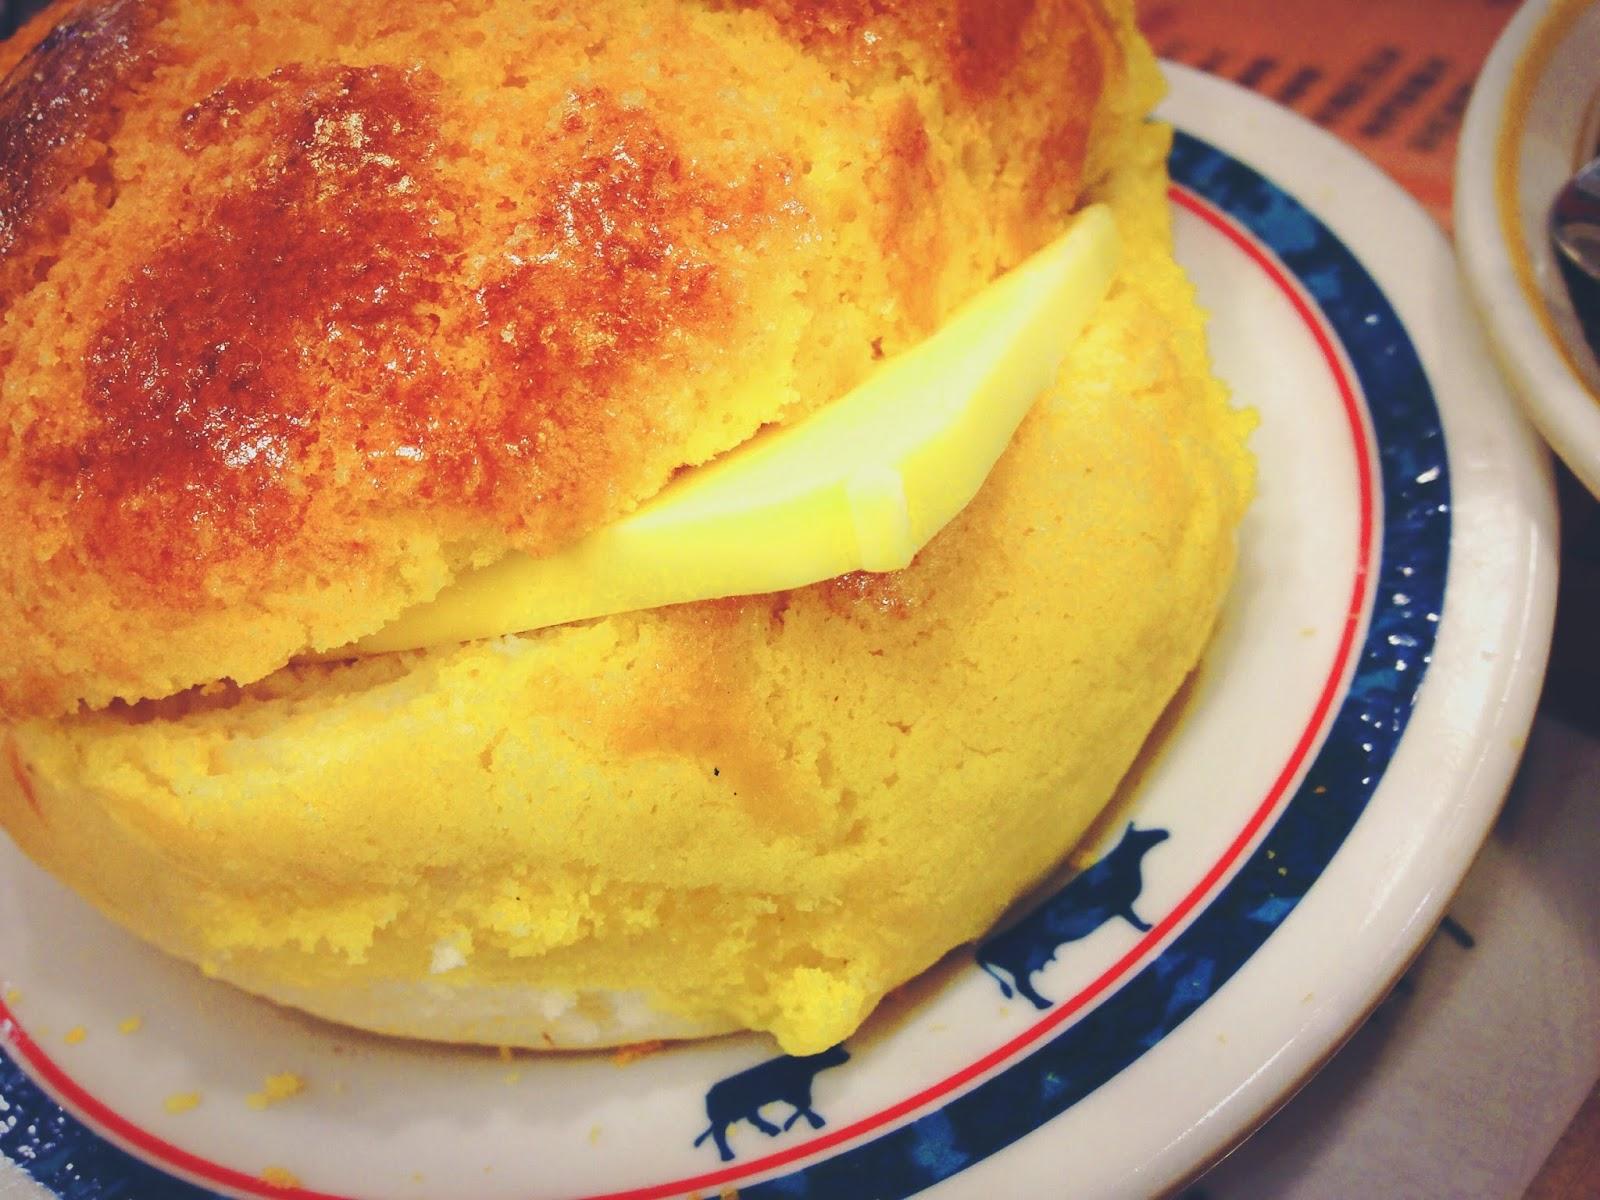 Kum Wah Cafe Hong Kong Polo Bun with Butter